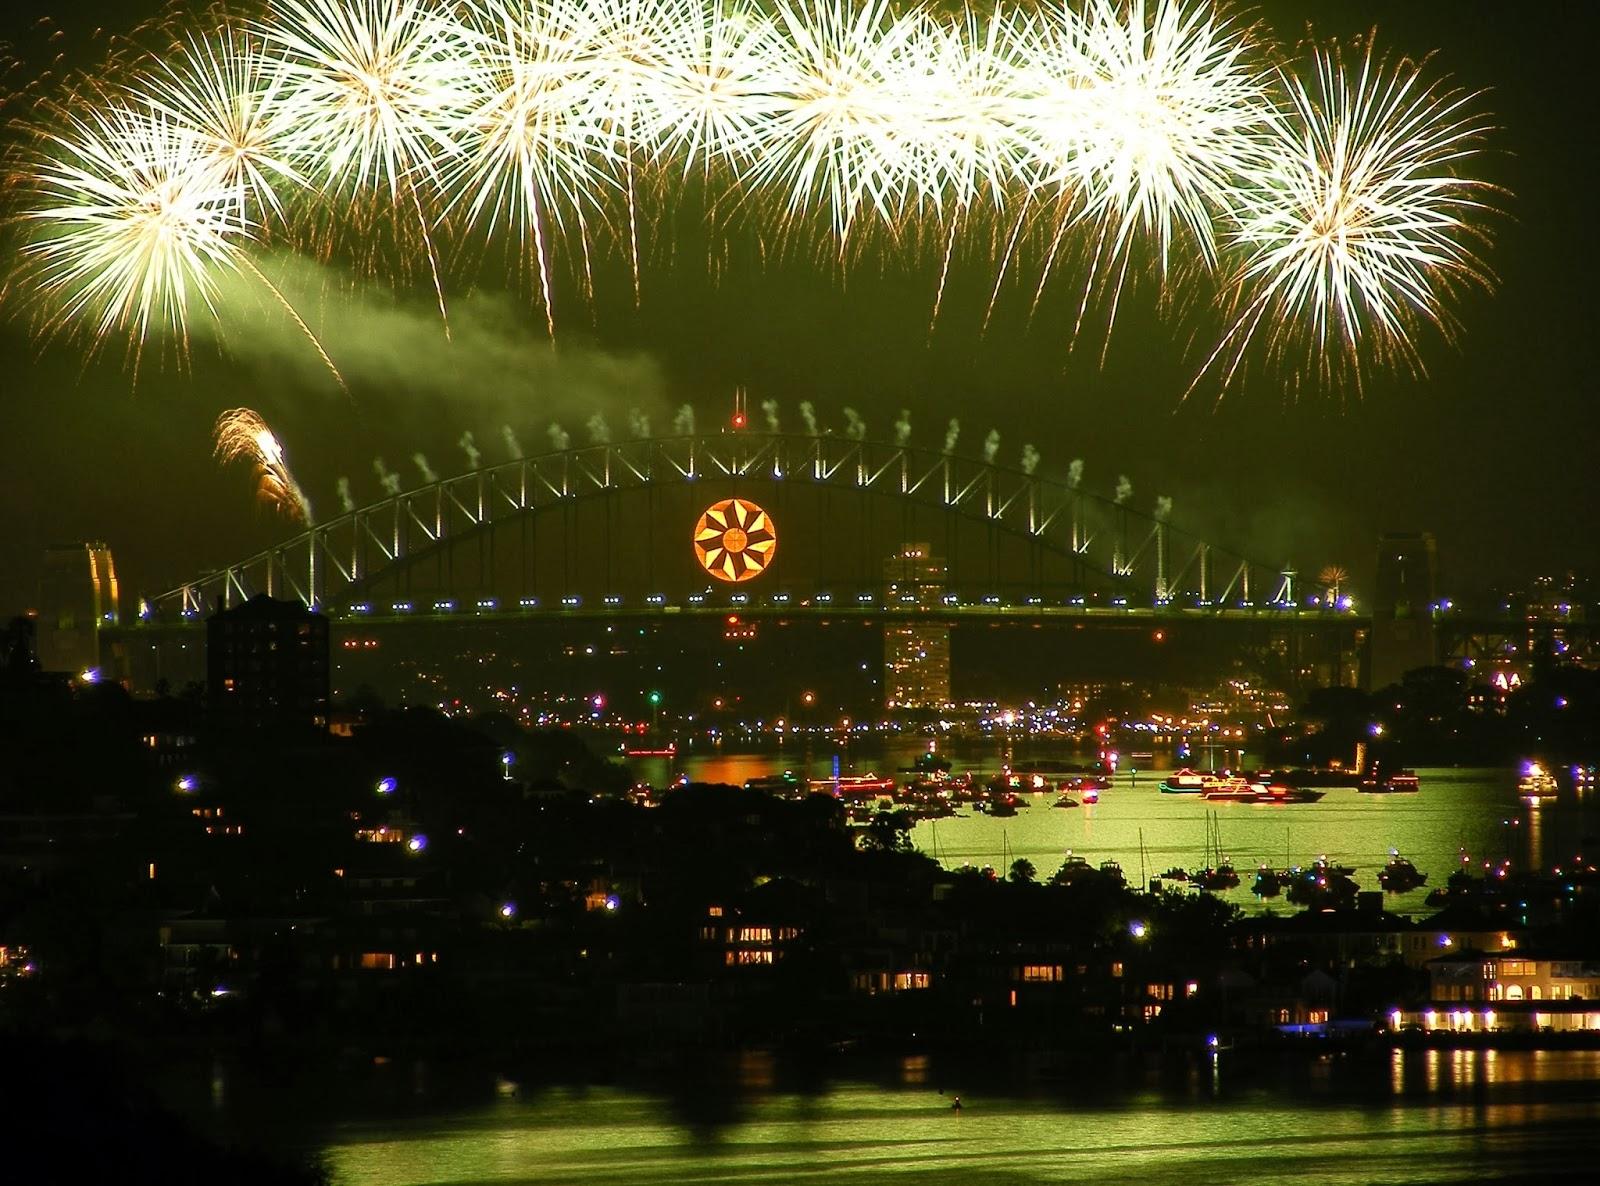 New year celebration in mumbai 2014 new year eve photos - New year celebration at home ...